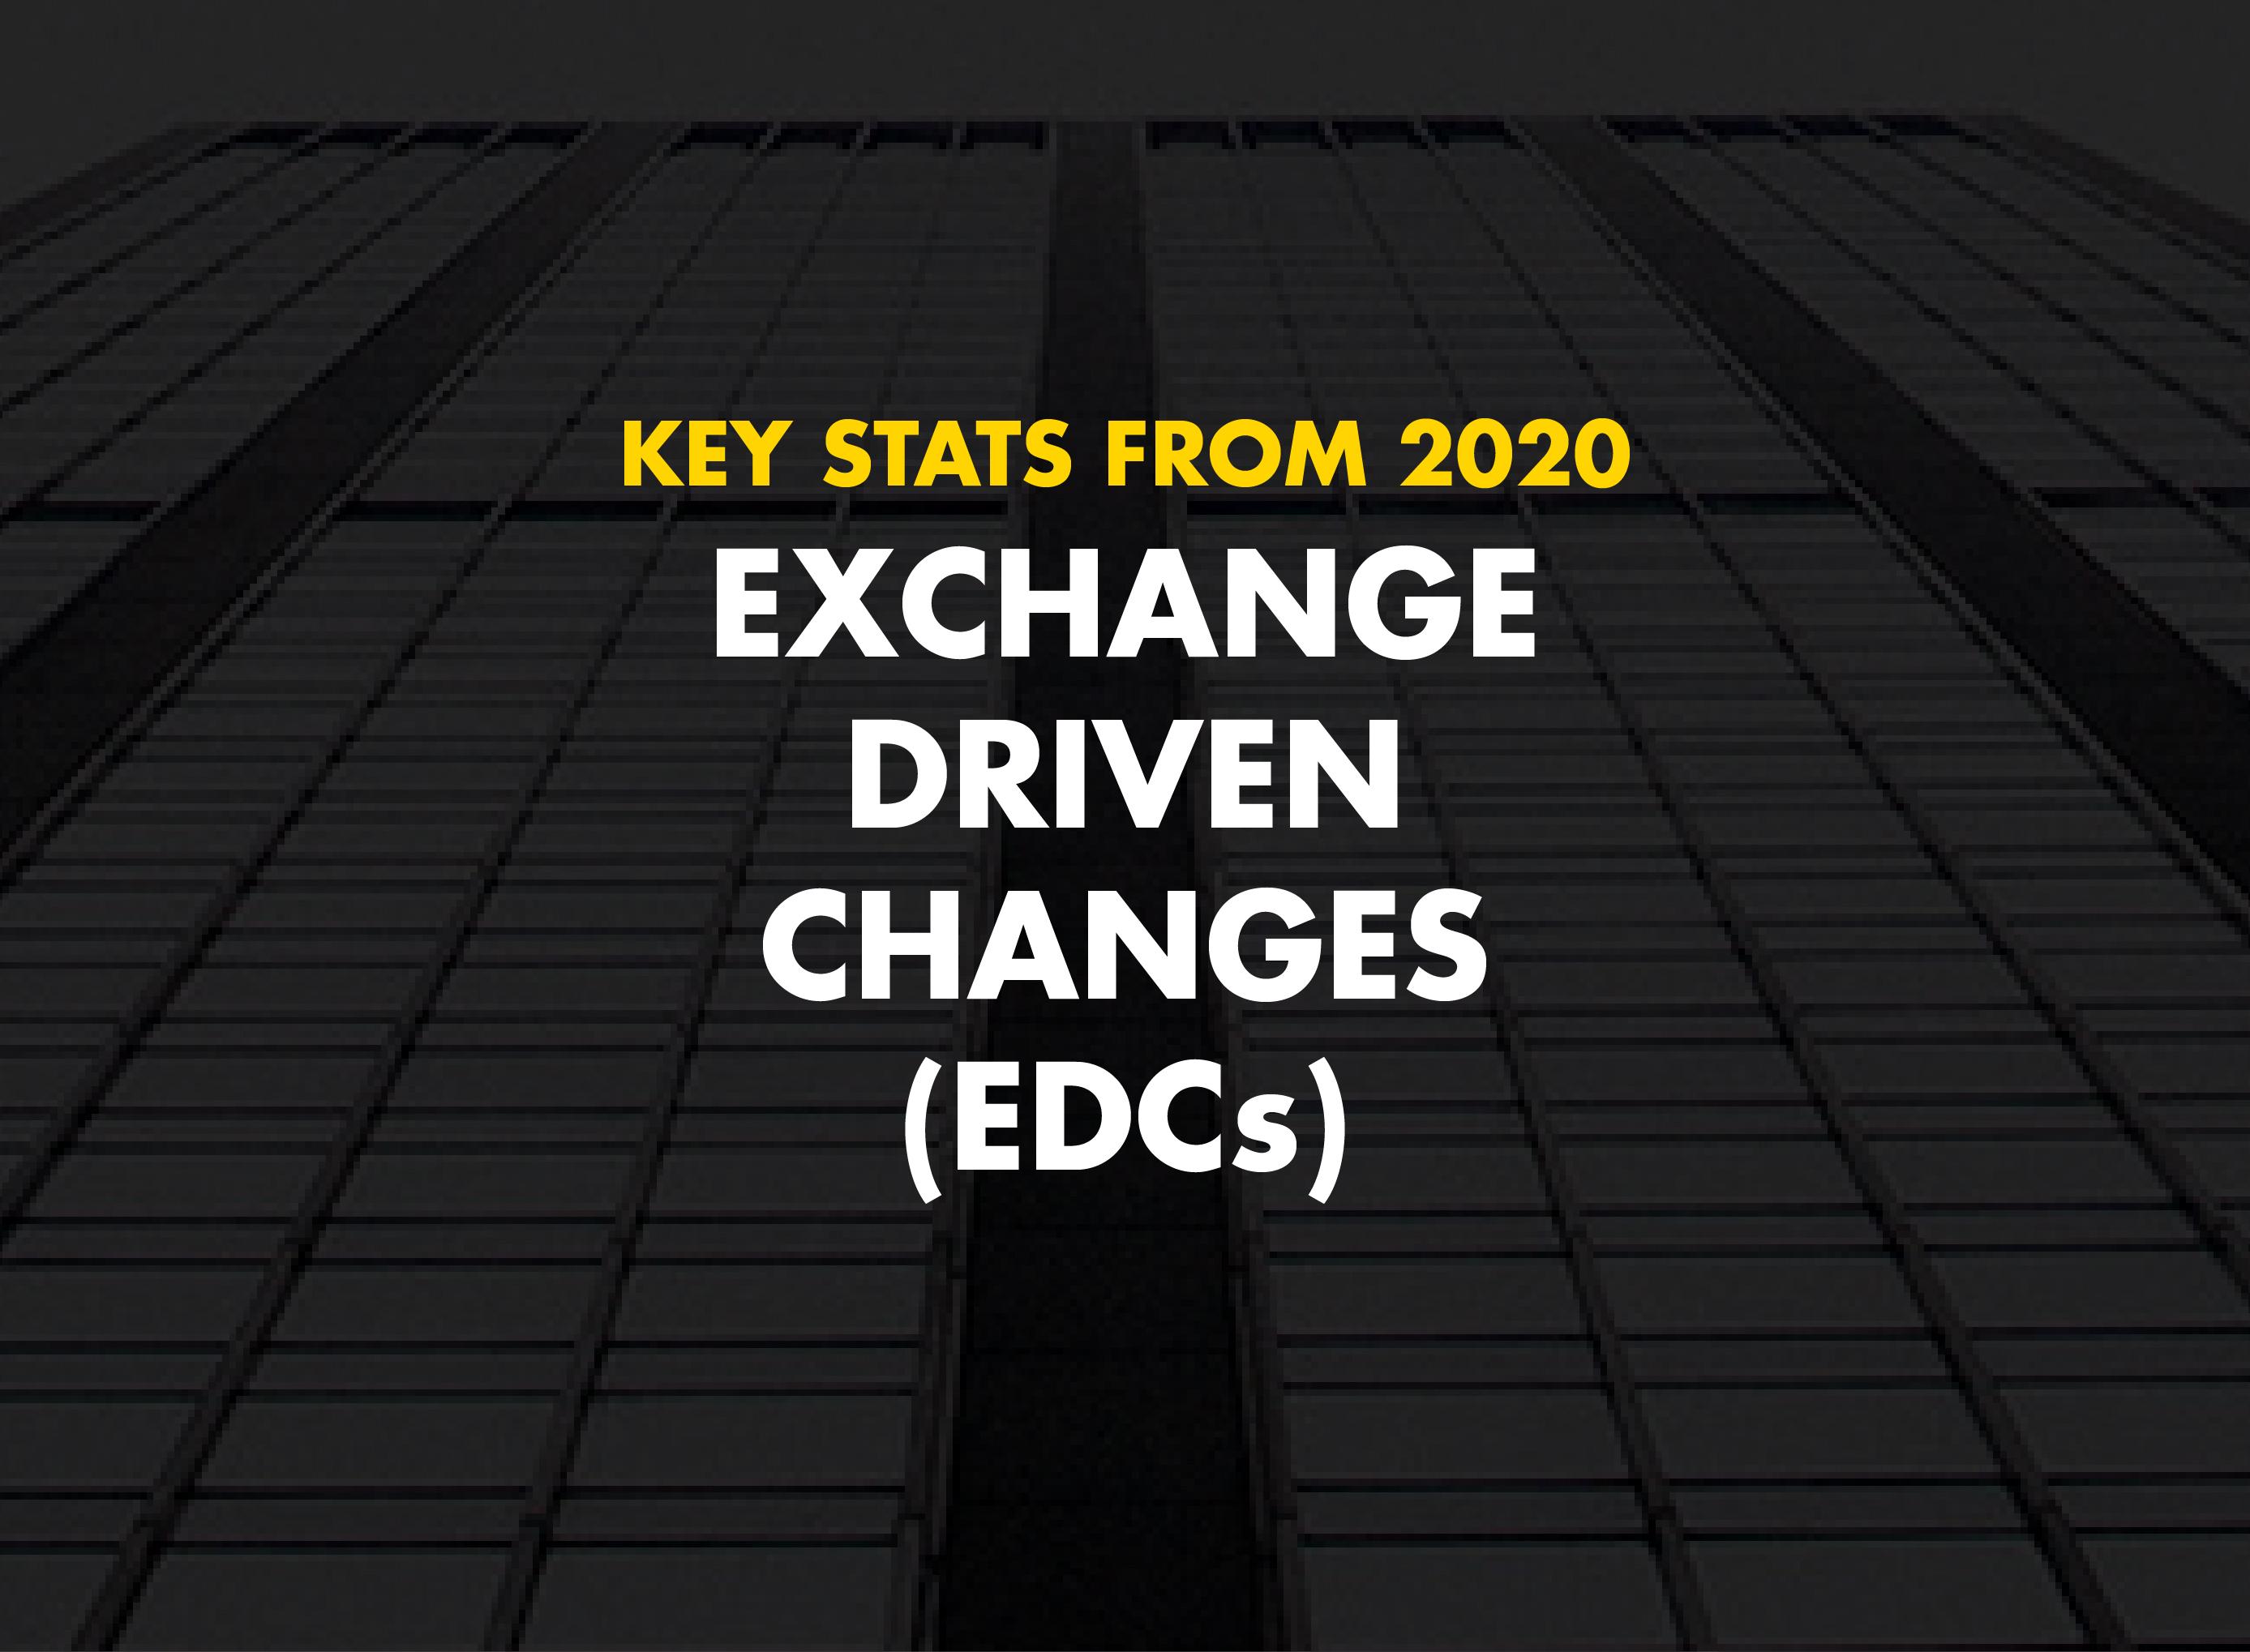 EDC Key Stats 2020